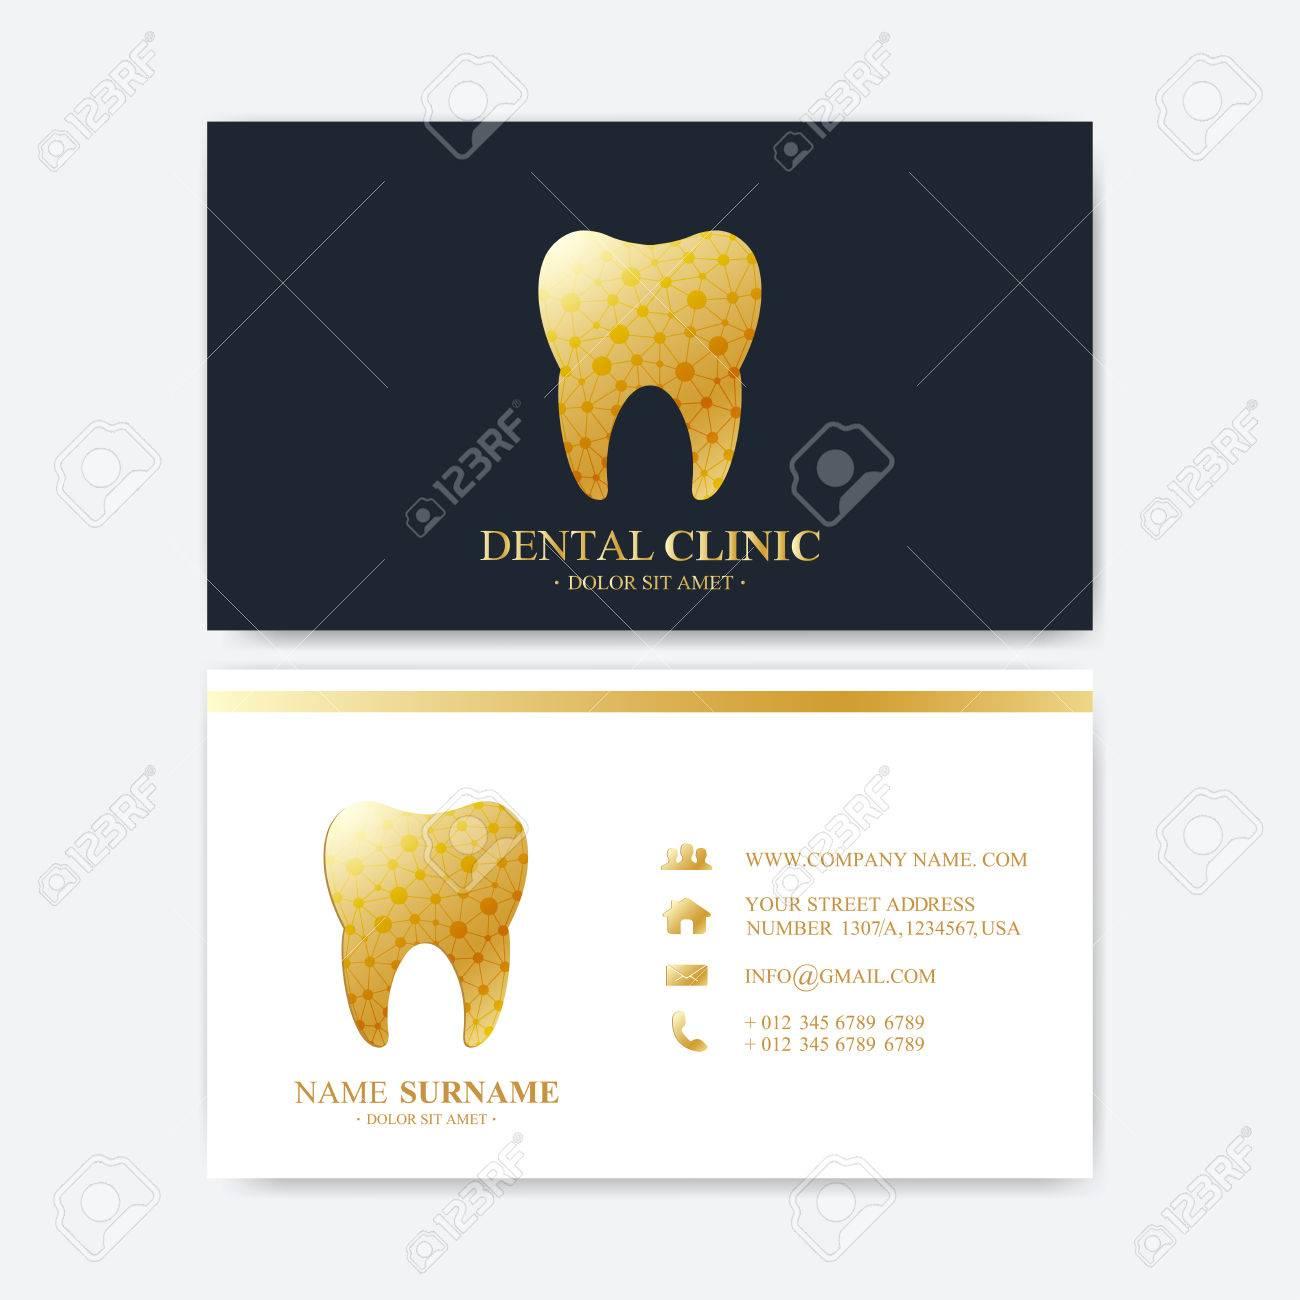 Premium business card print template visiting dental clinic premium business card print template visiting dental clinic card with tooth stock vector 67965276 colourmoves